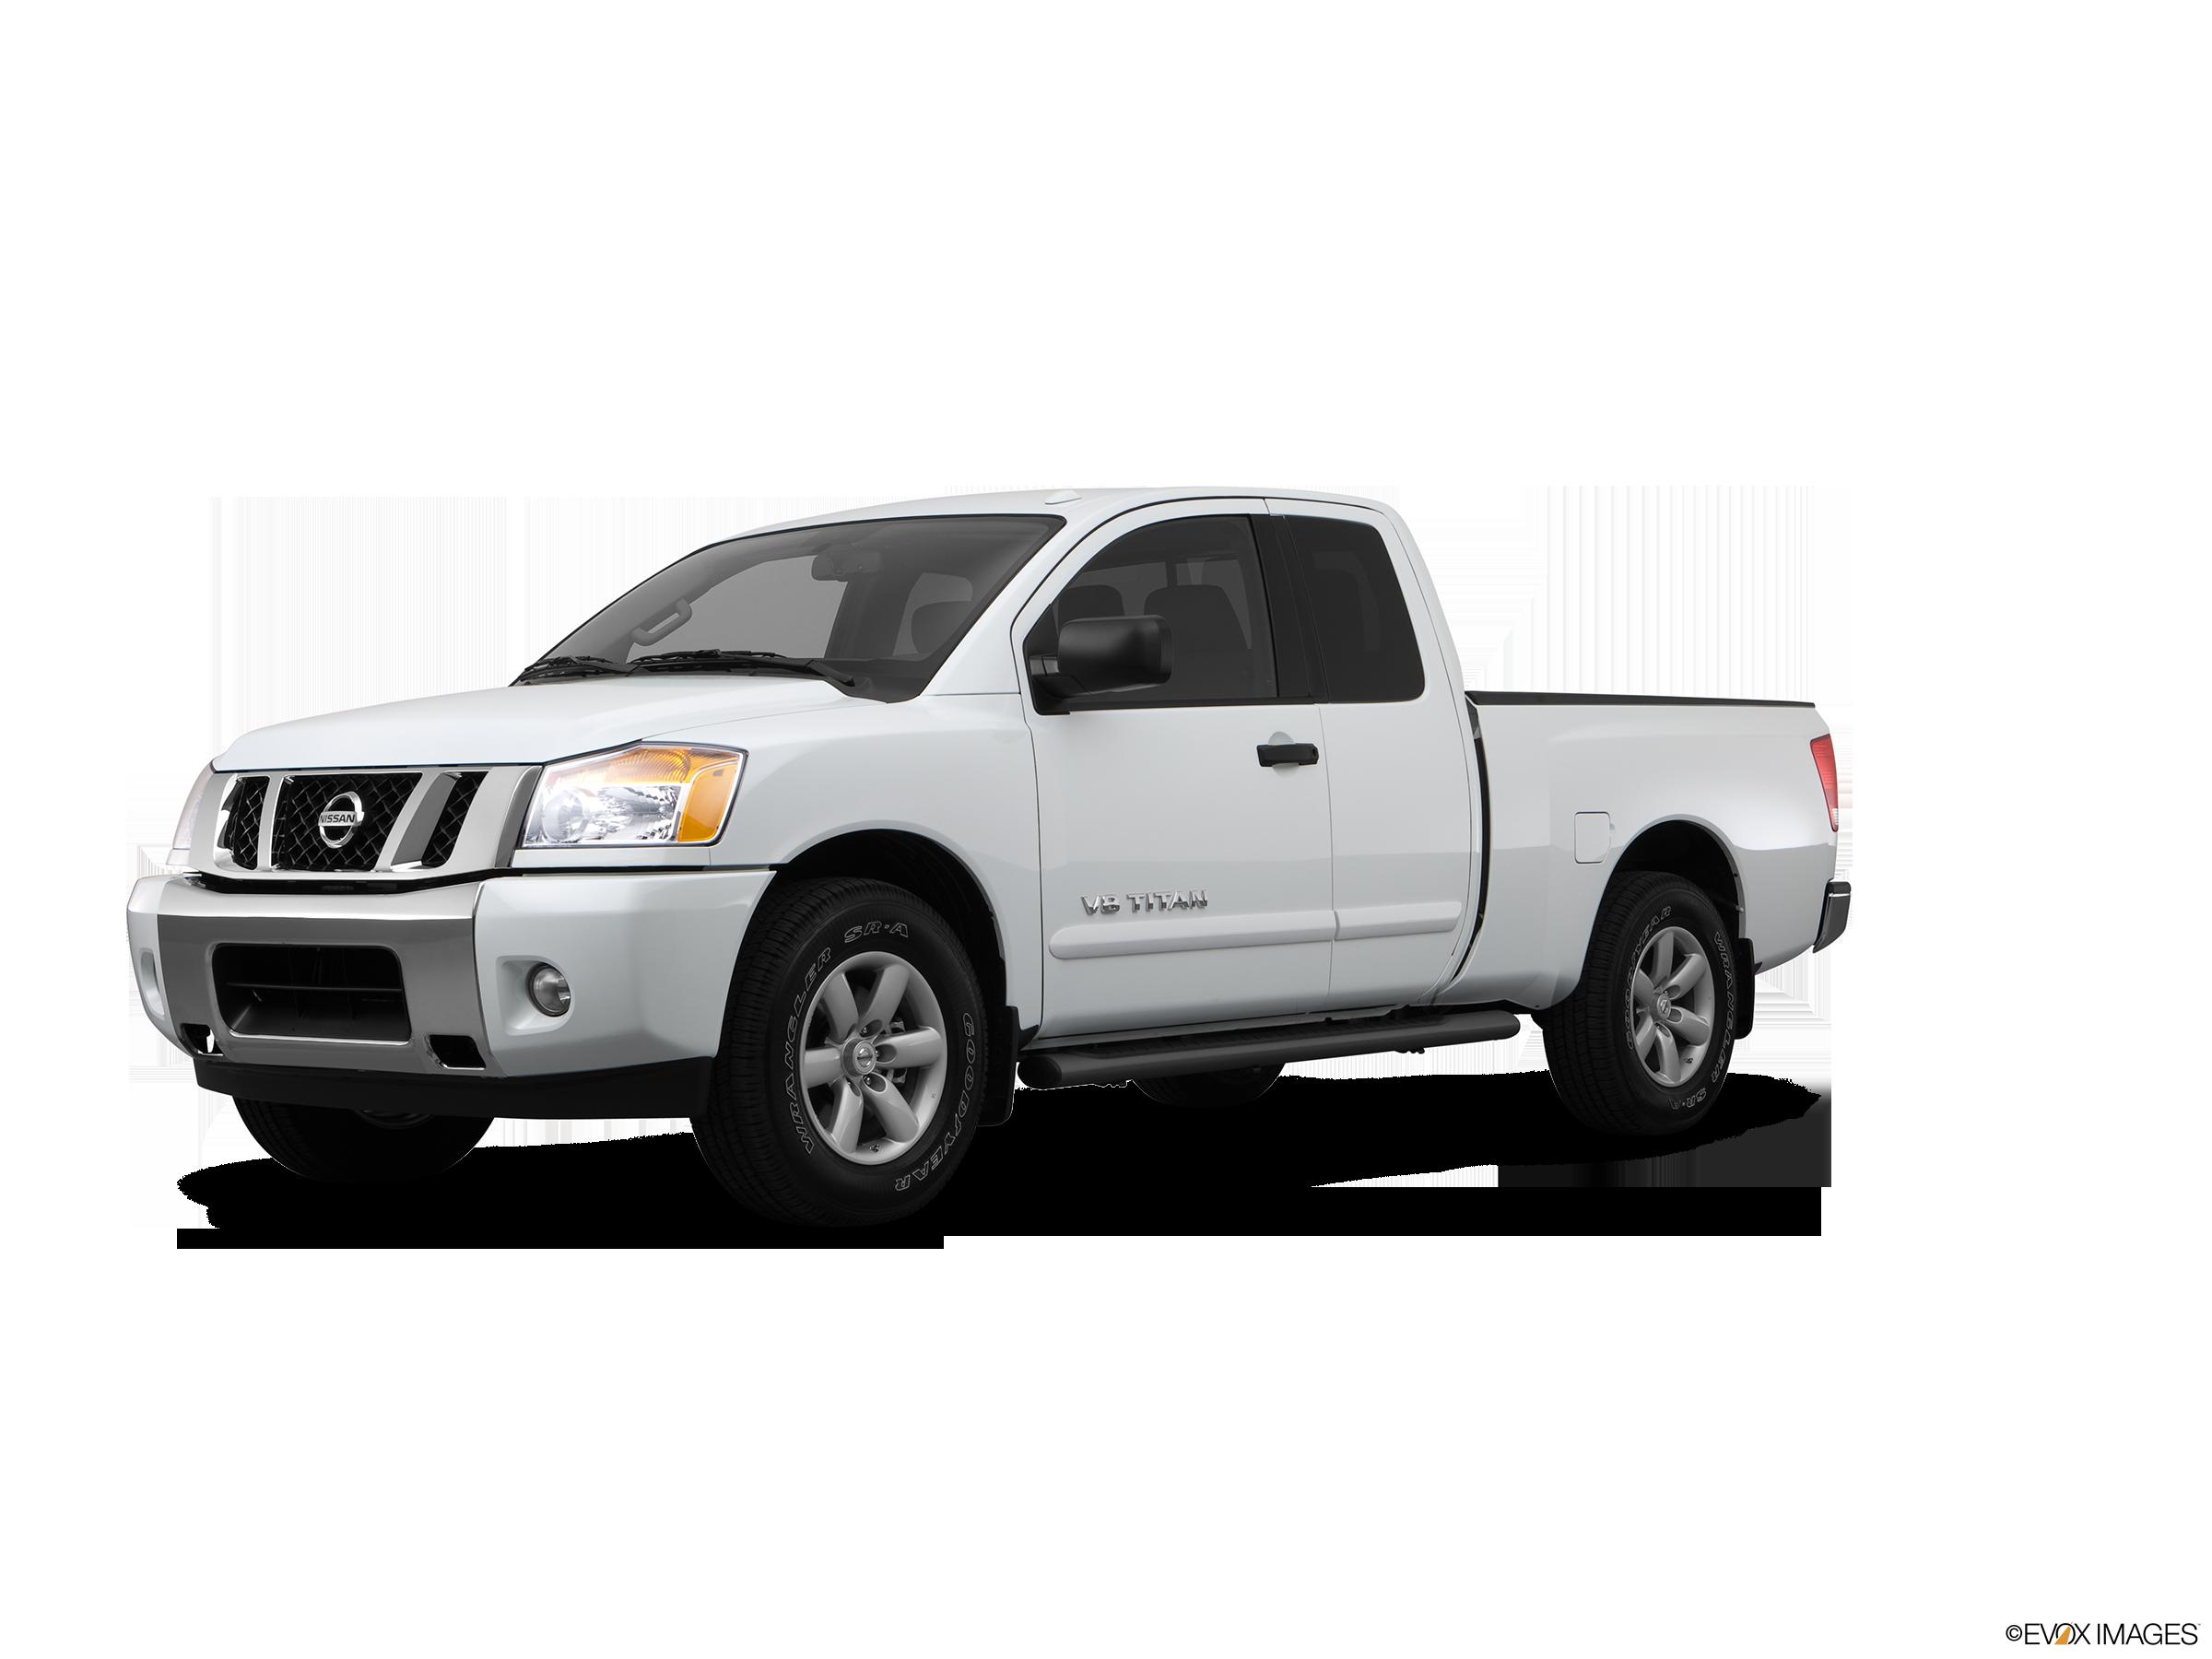 2013 Nissan Titan Values Cars For Sale Kelley Blue Book